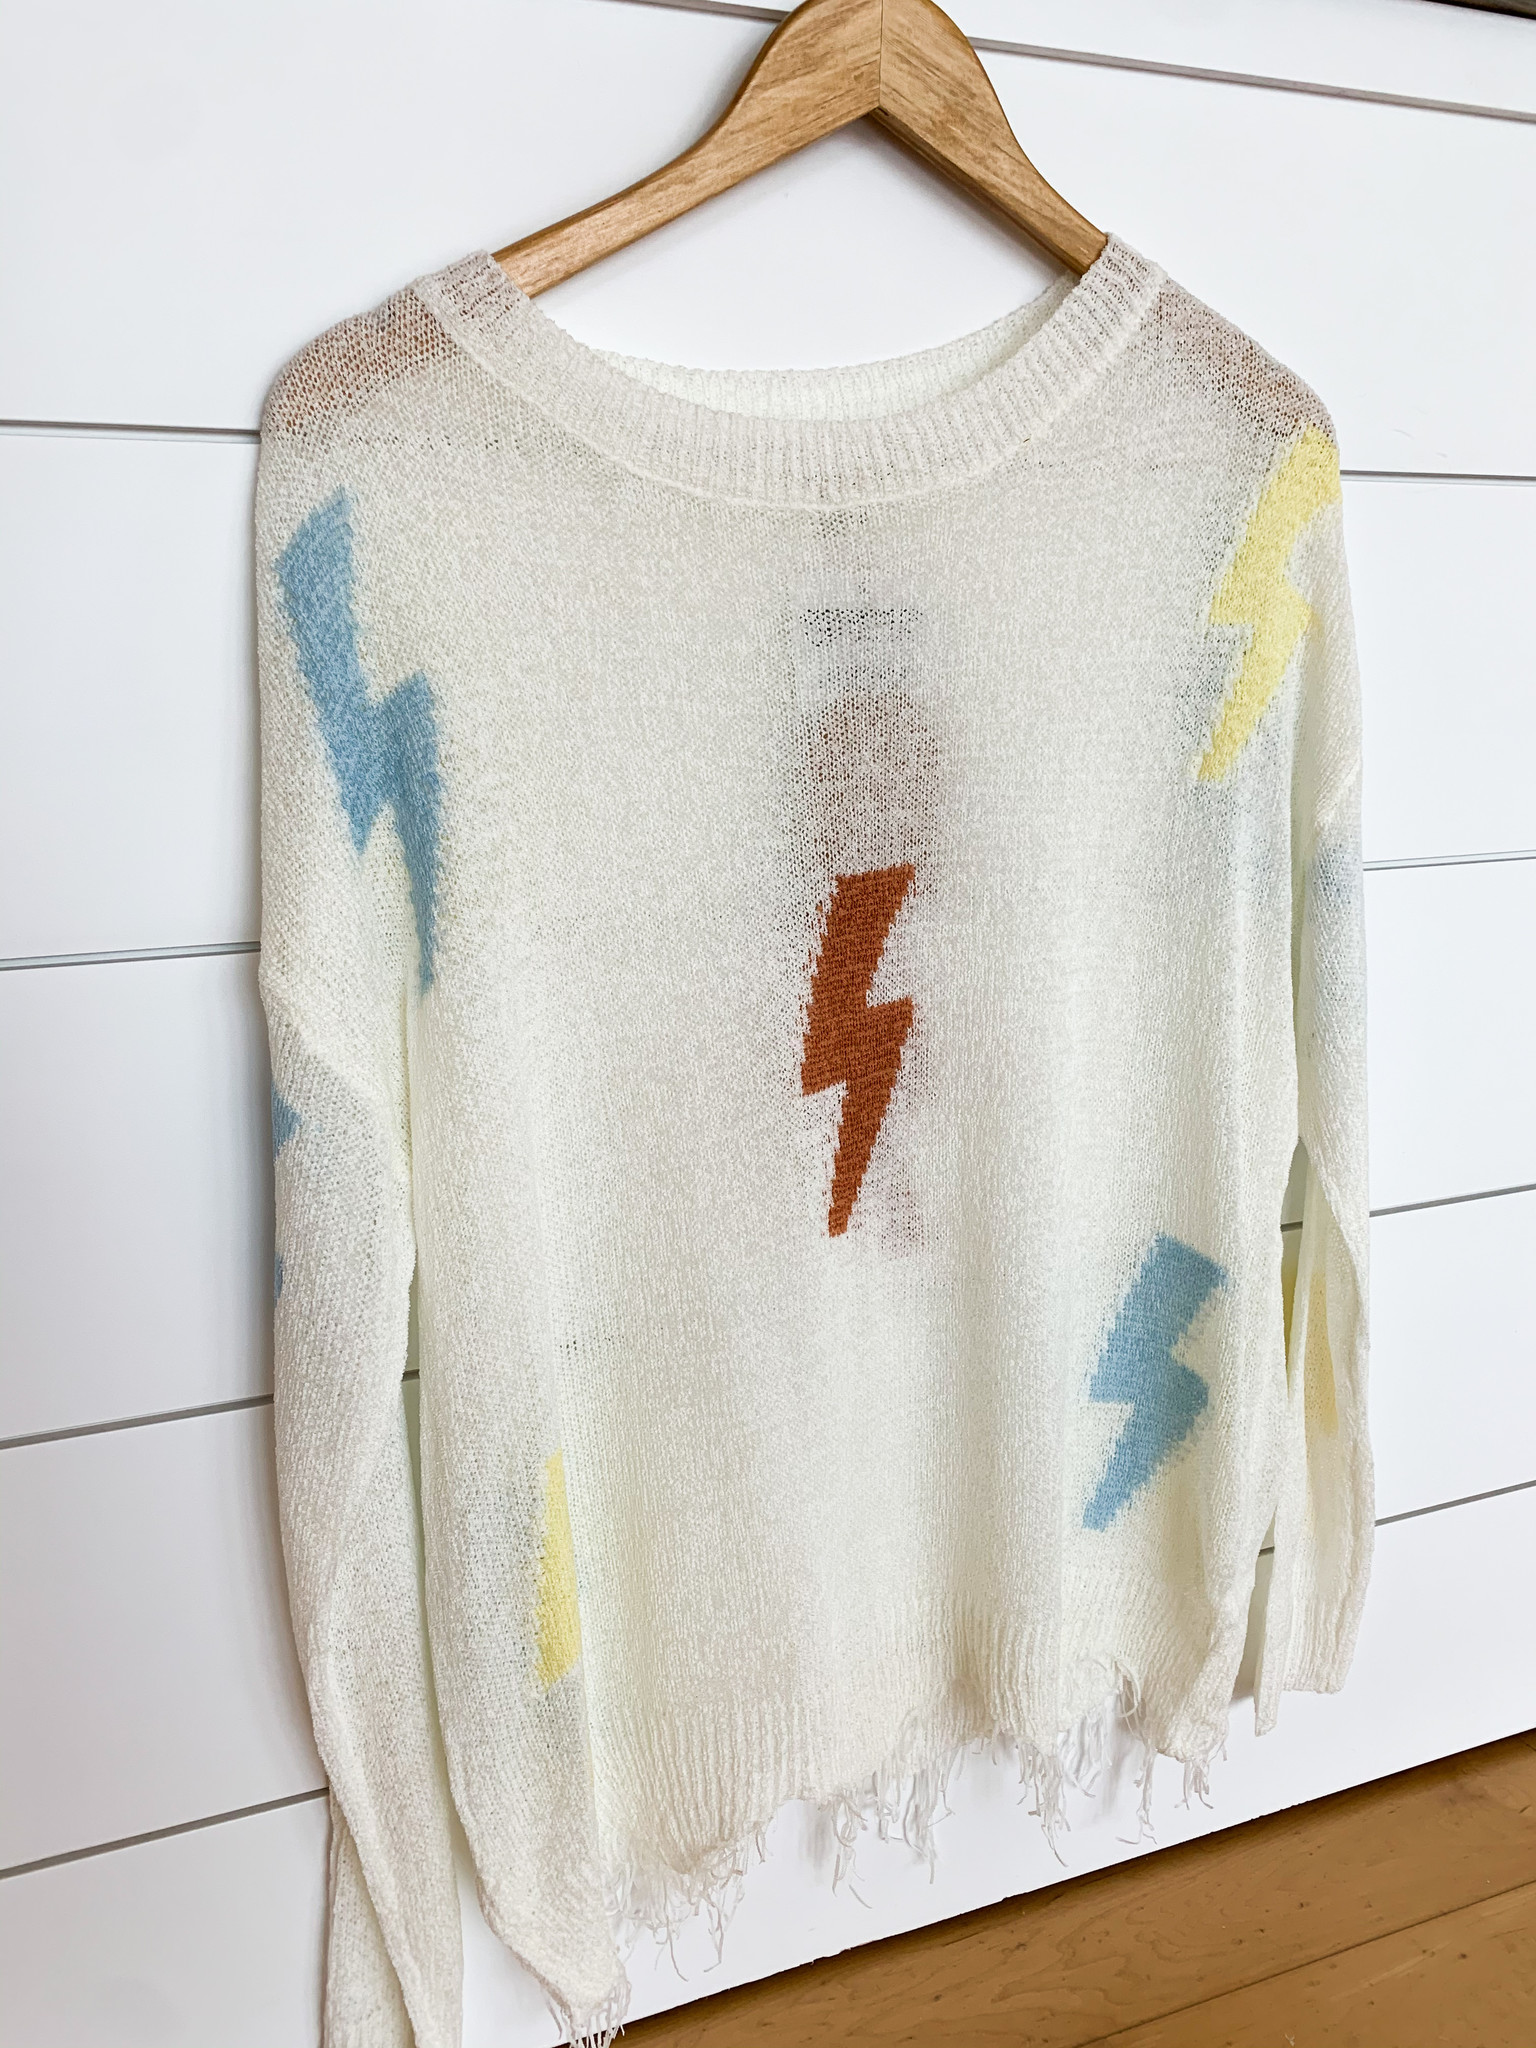 Main Strip Apparel Round Neck Distressed Thunder Print Sweater